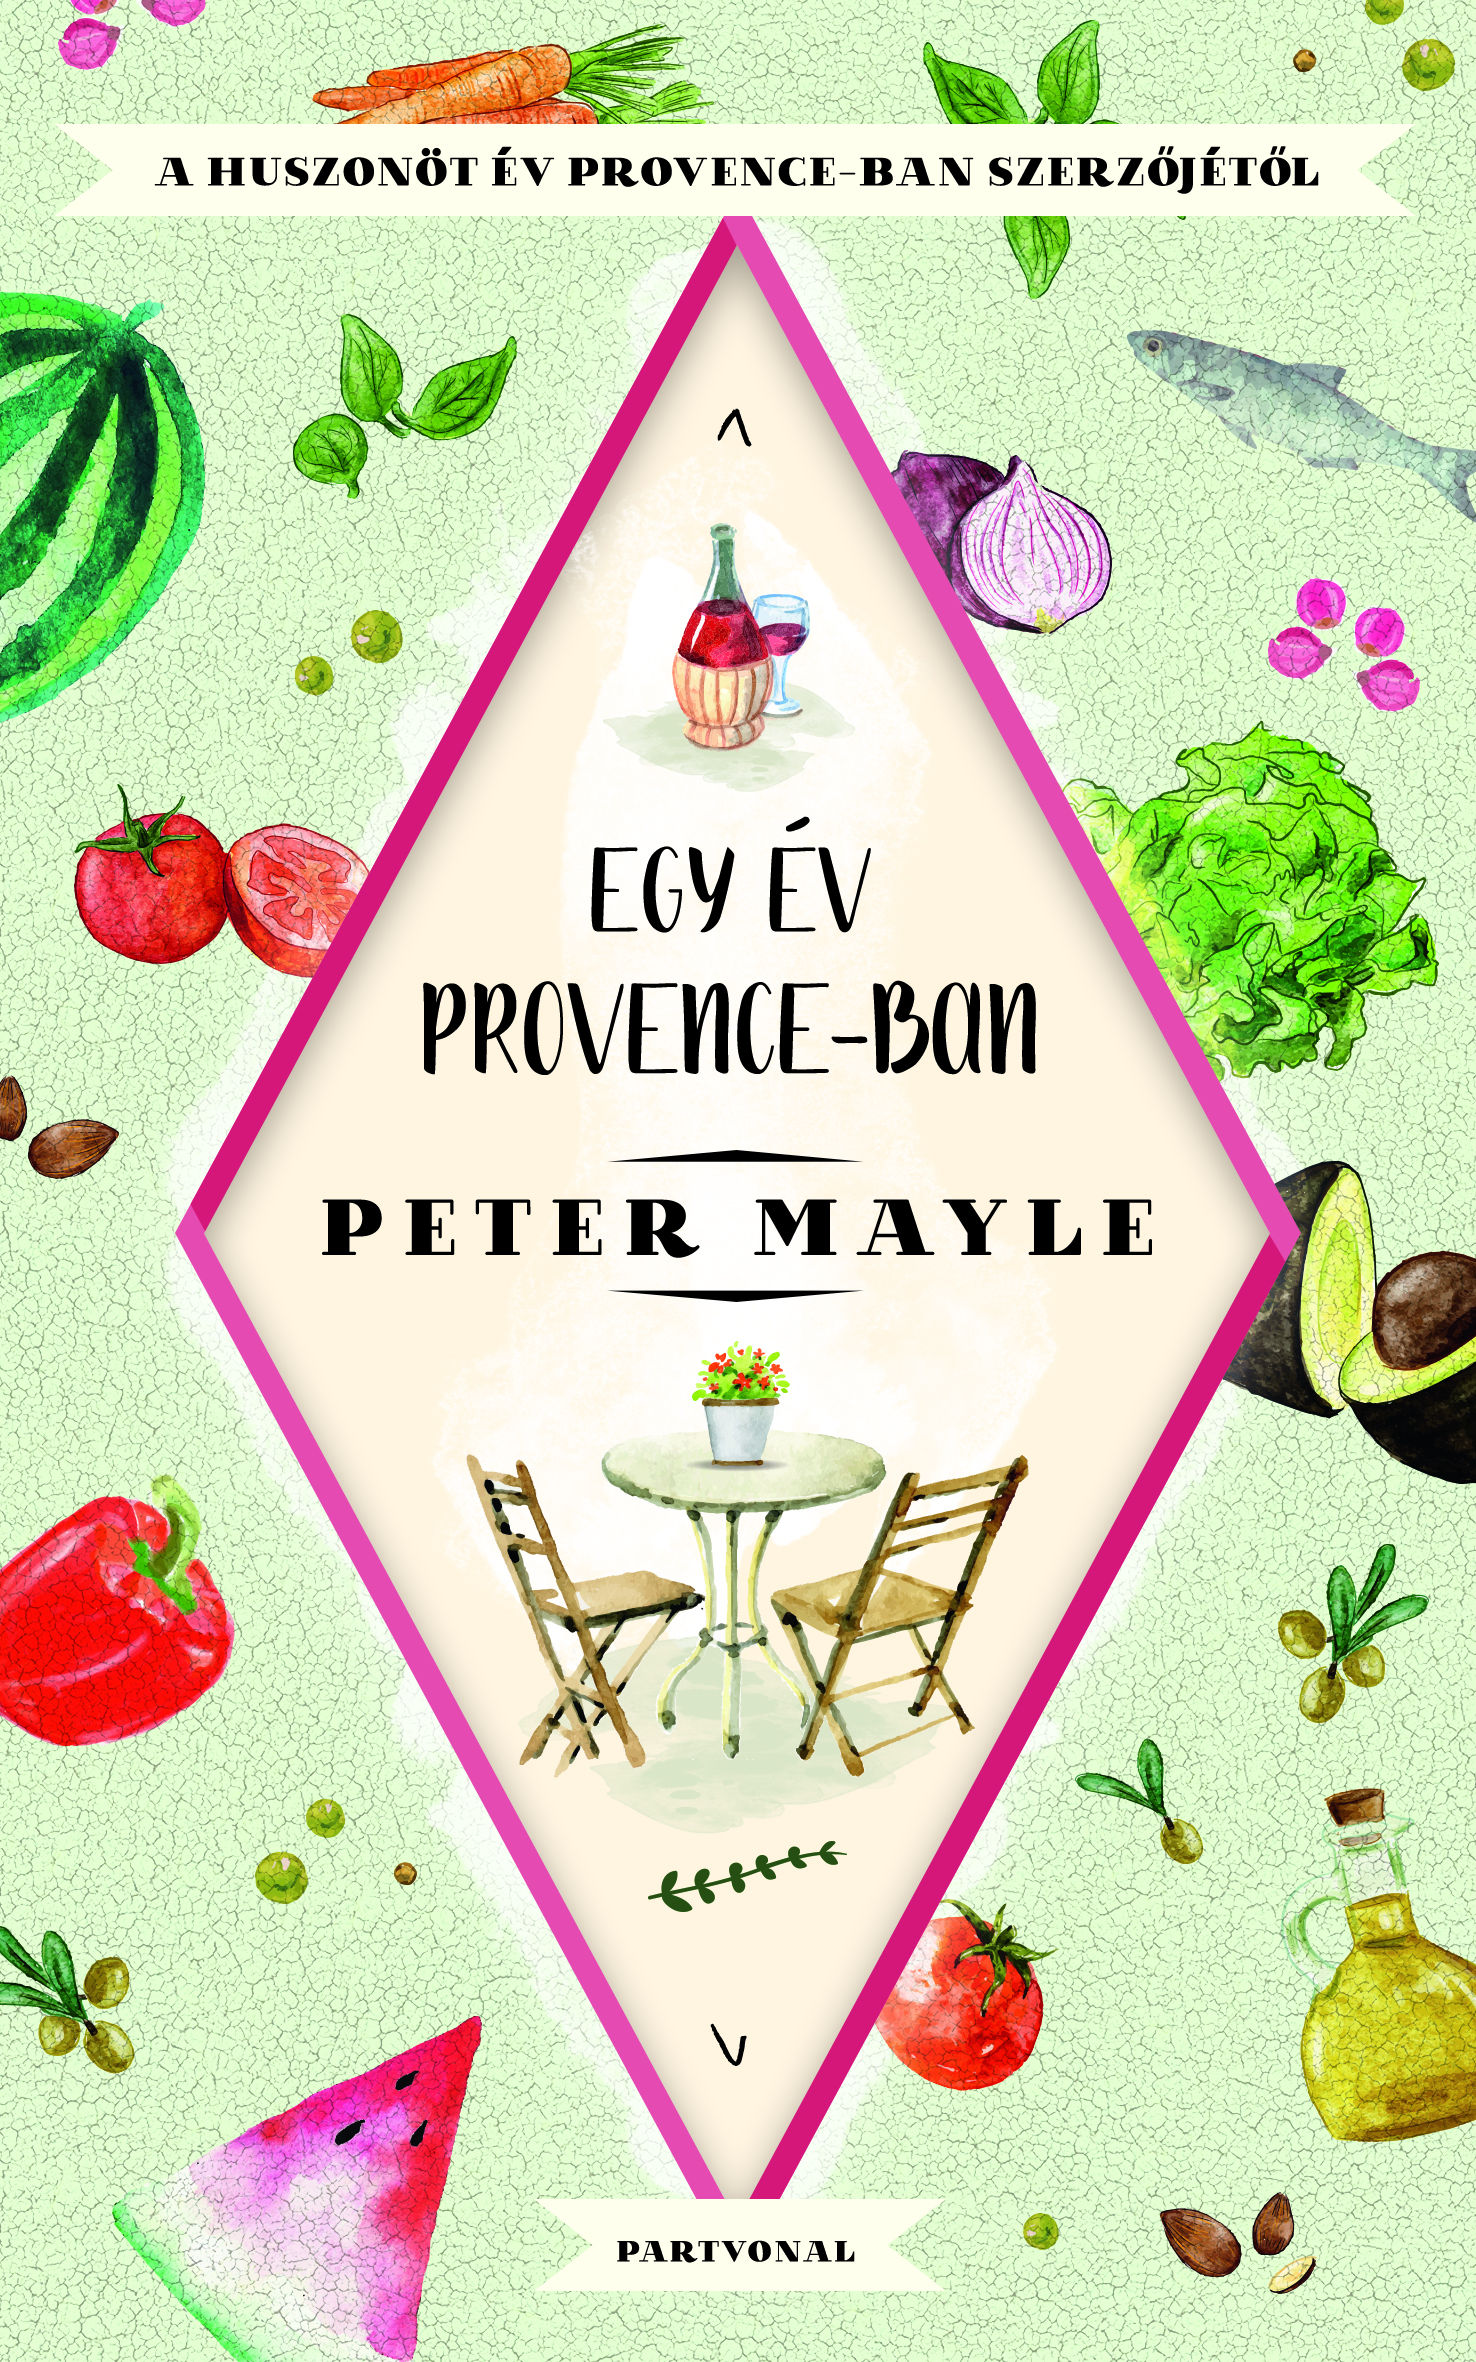 Peter Mayle: Egy év Provence-ban